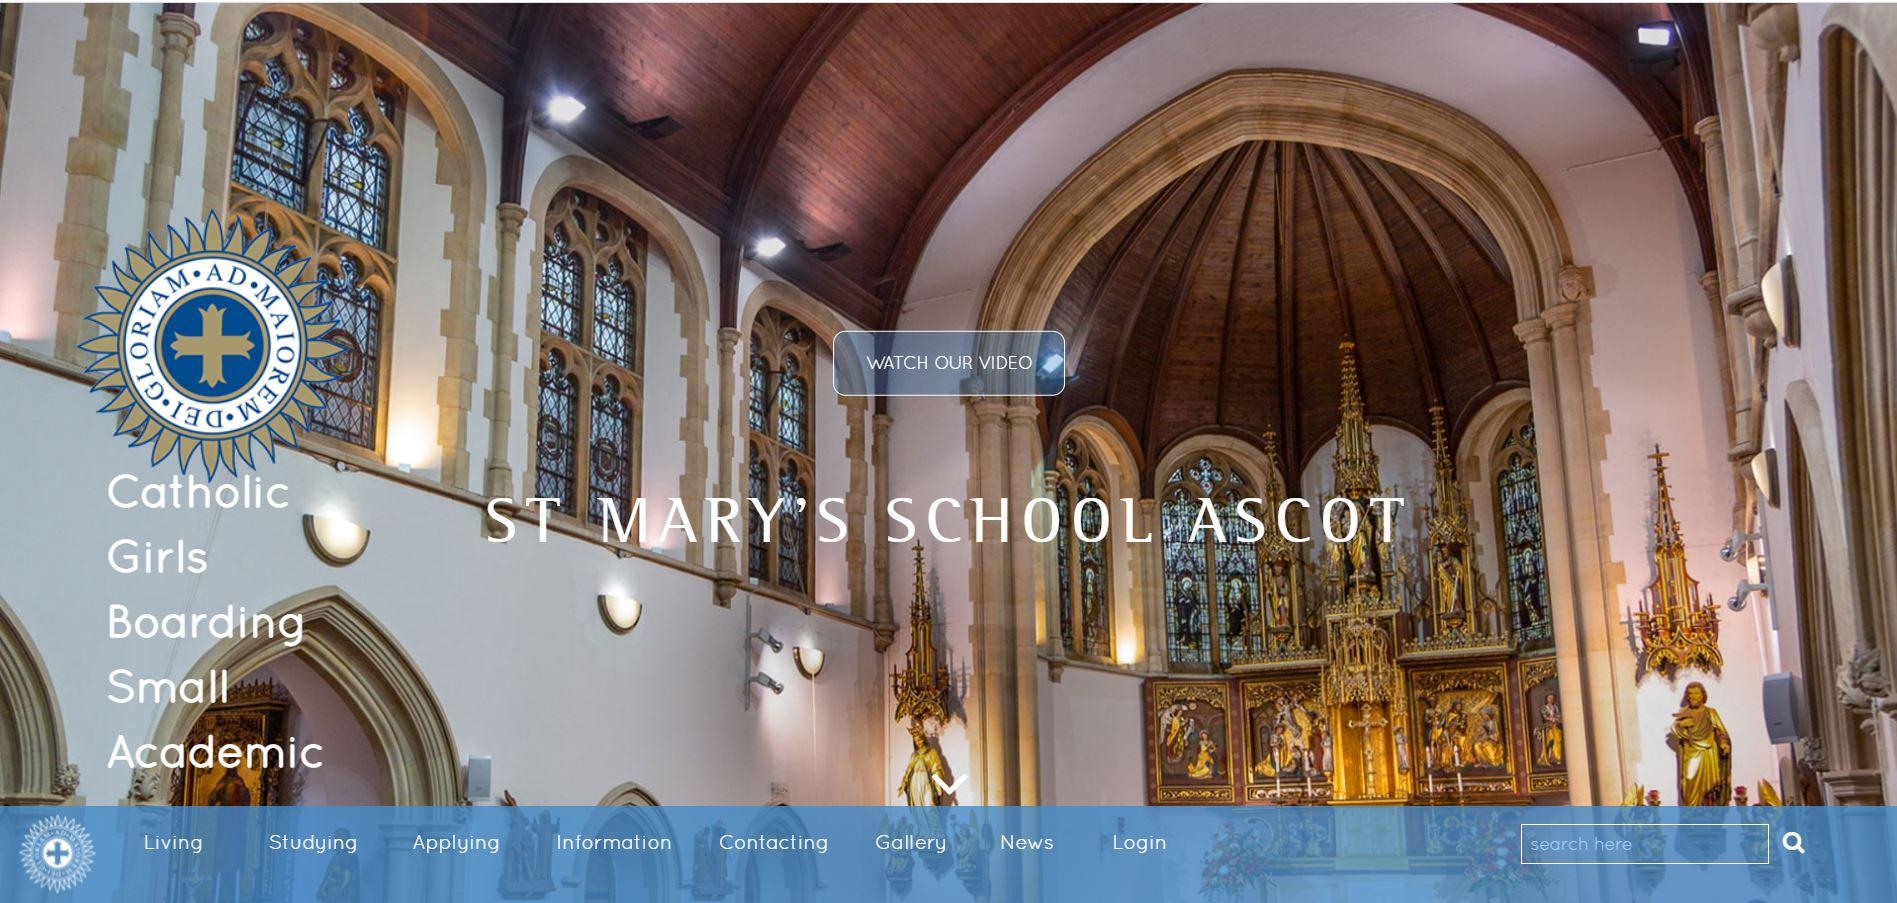 The St Mary's School